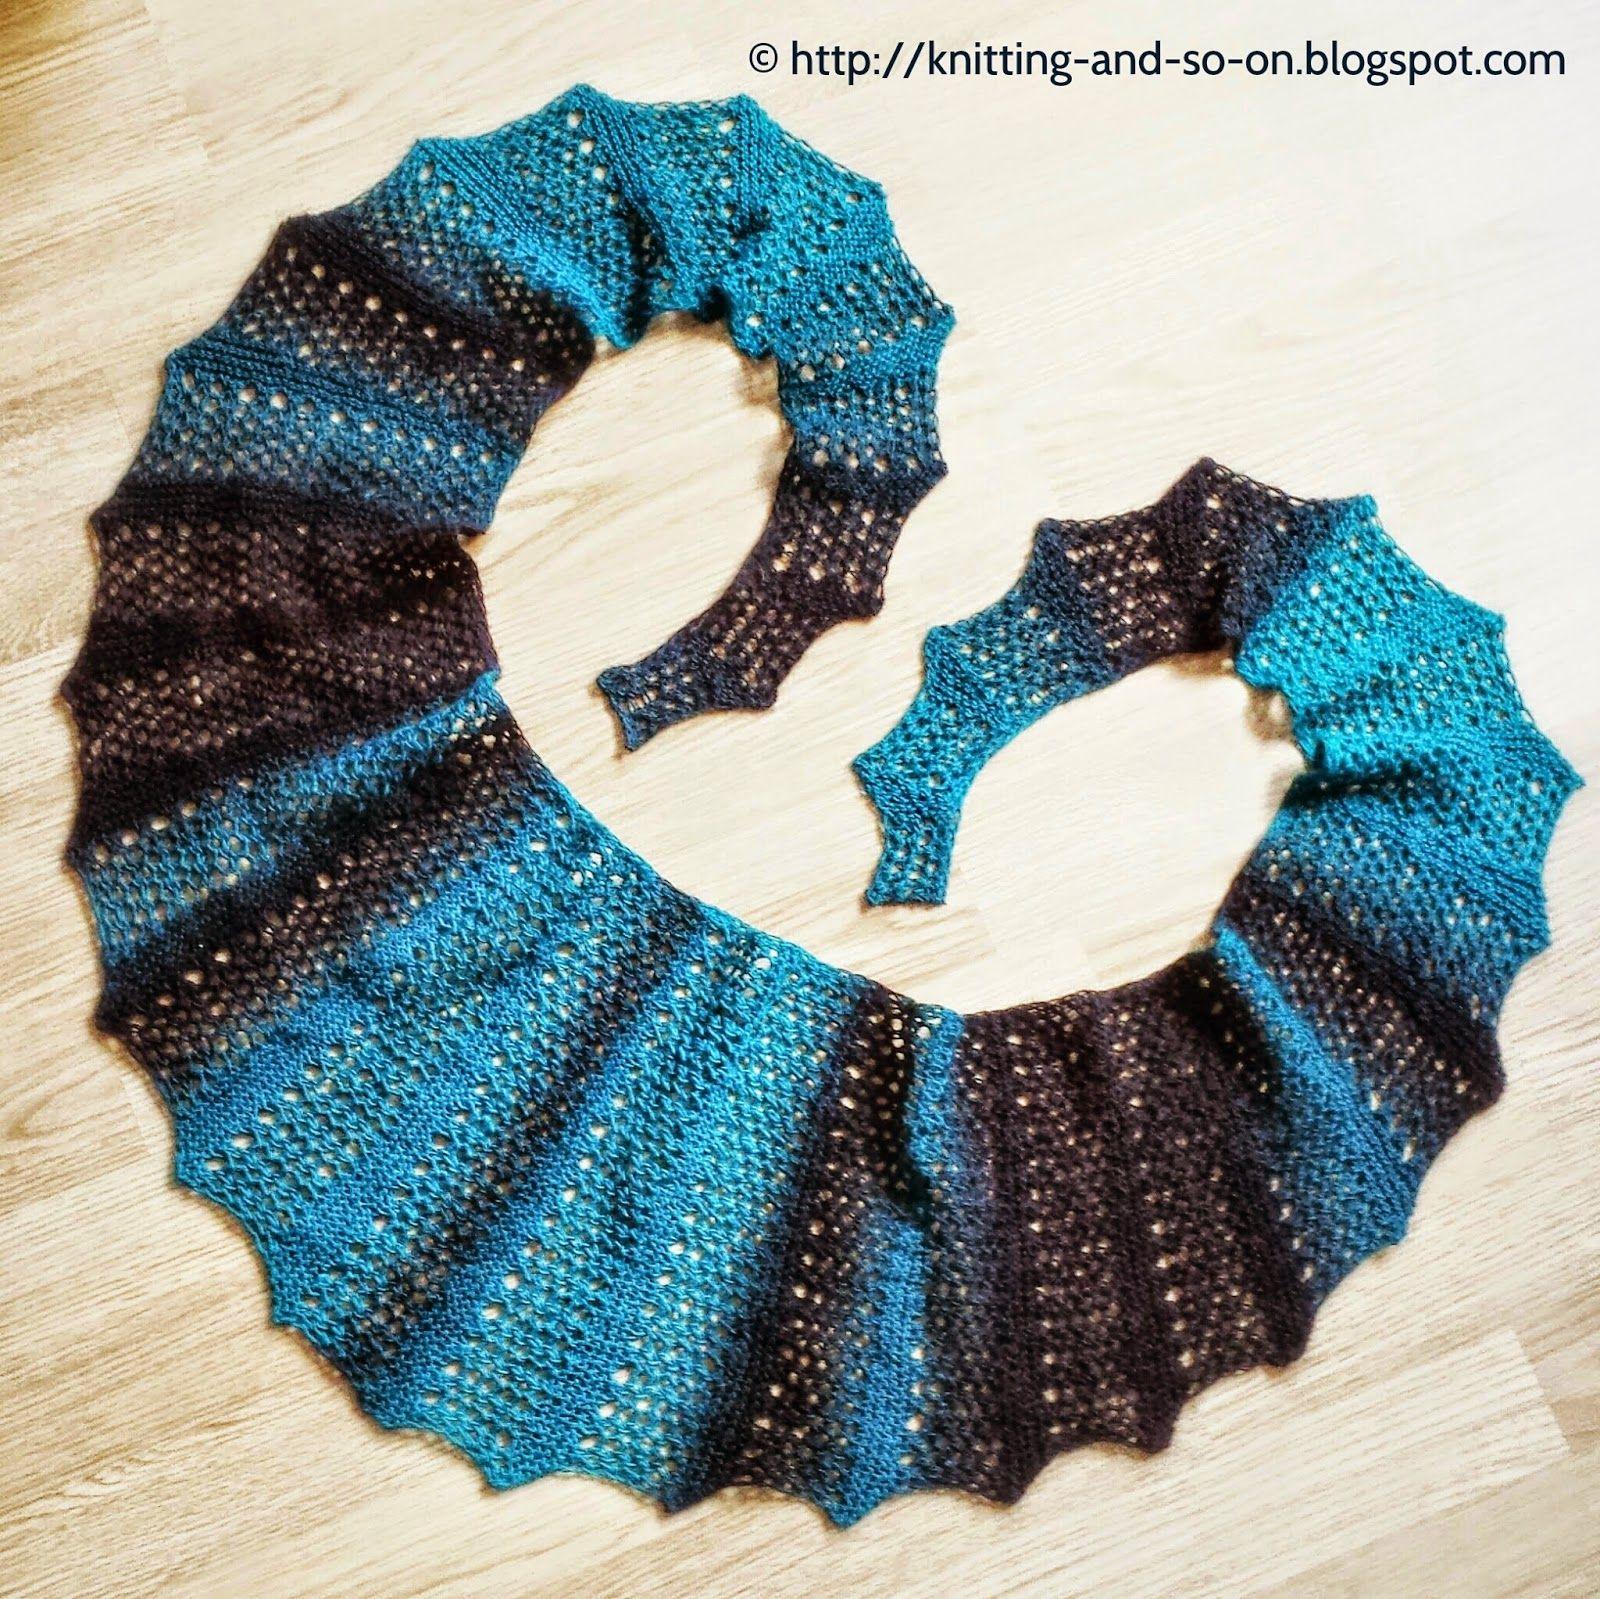 Seifenblasen Lace Scarf | Knit Wit | Pinterest | Seifenblasen ...